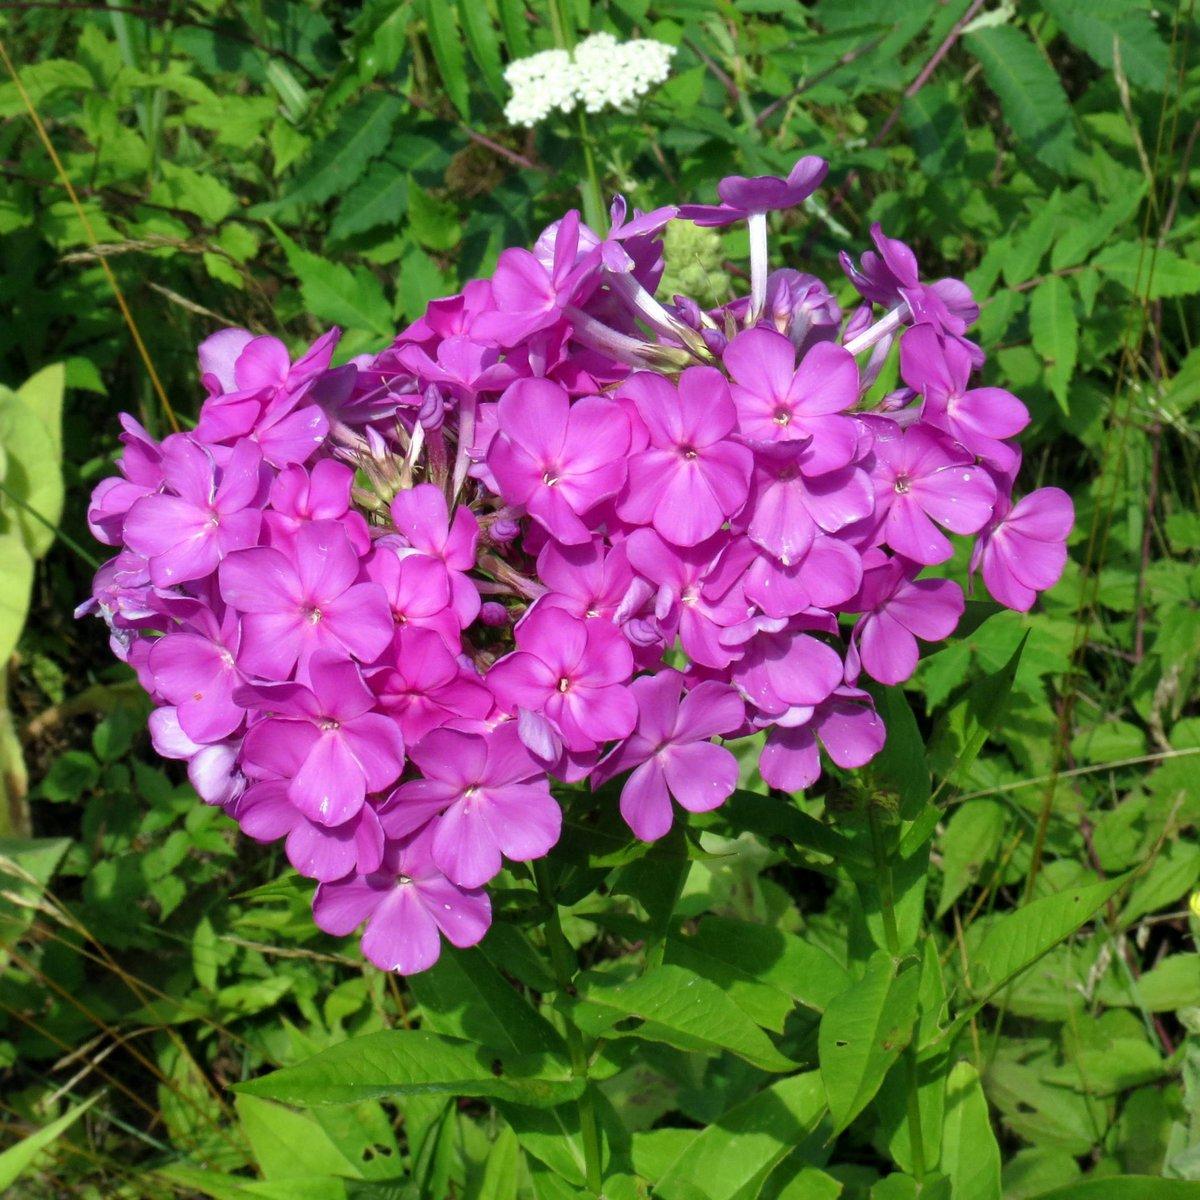 14. Purple Phlox